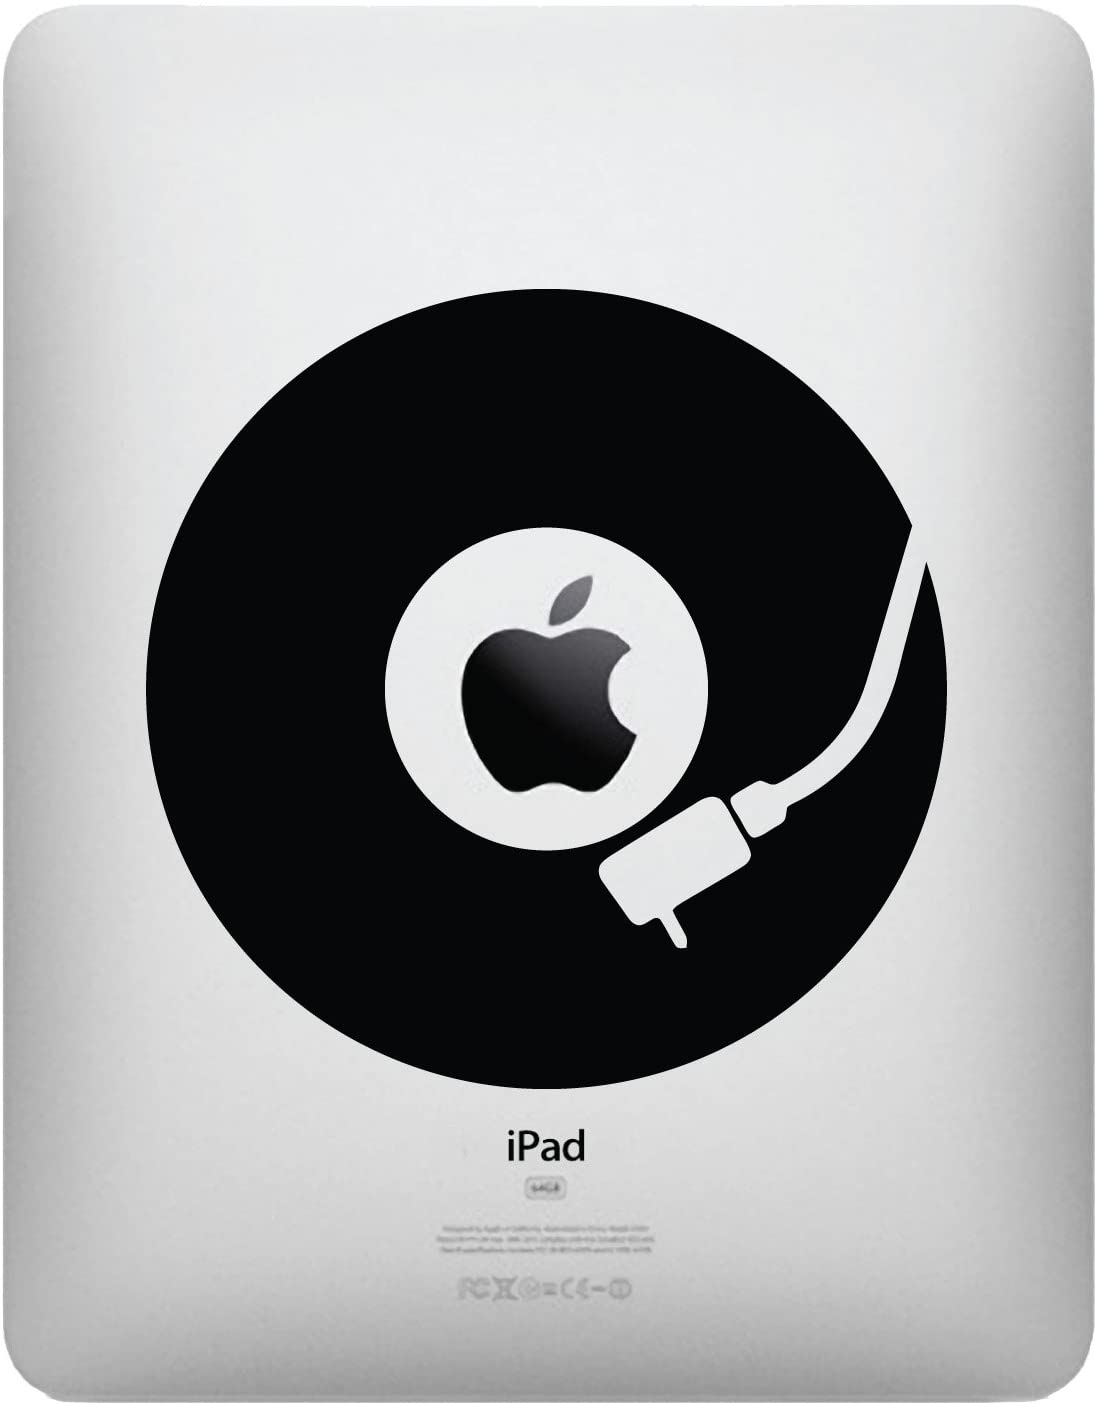 Yadda-Yadda Design Co. IPAD - Vinyl Record - Vinyl Decal Sticker for iPad (5.25